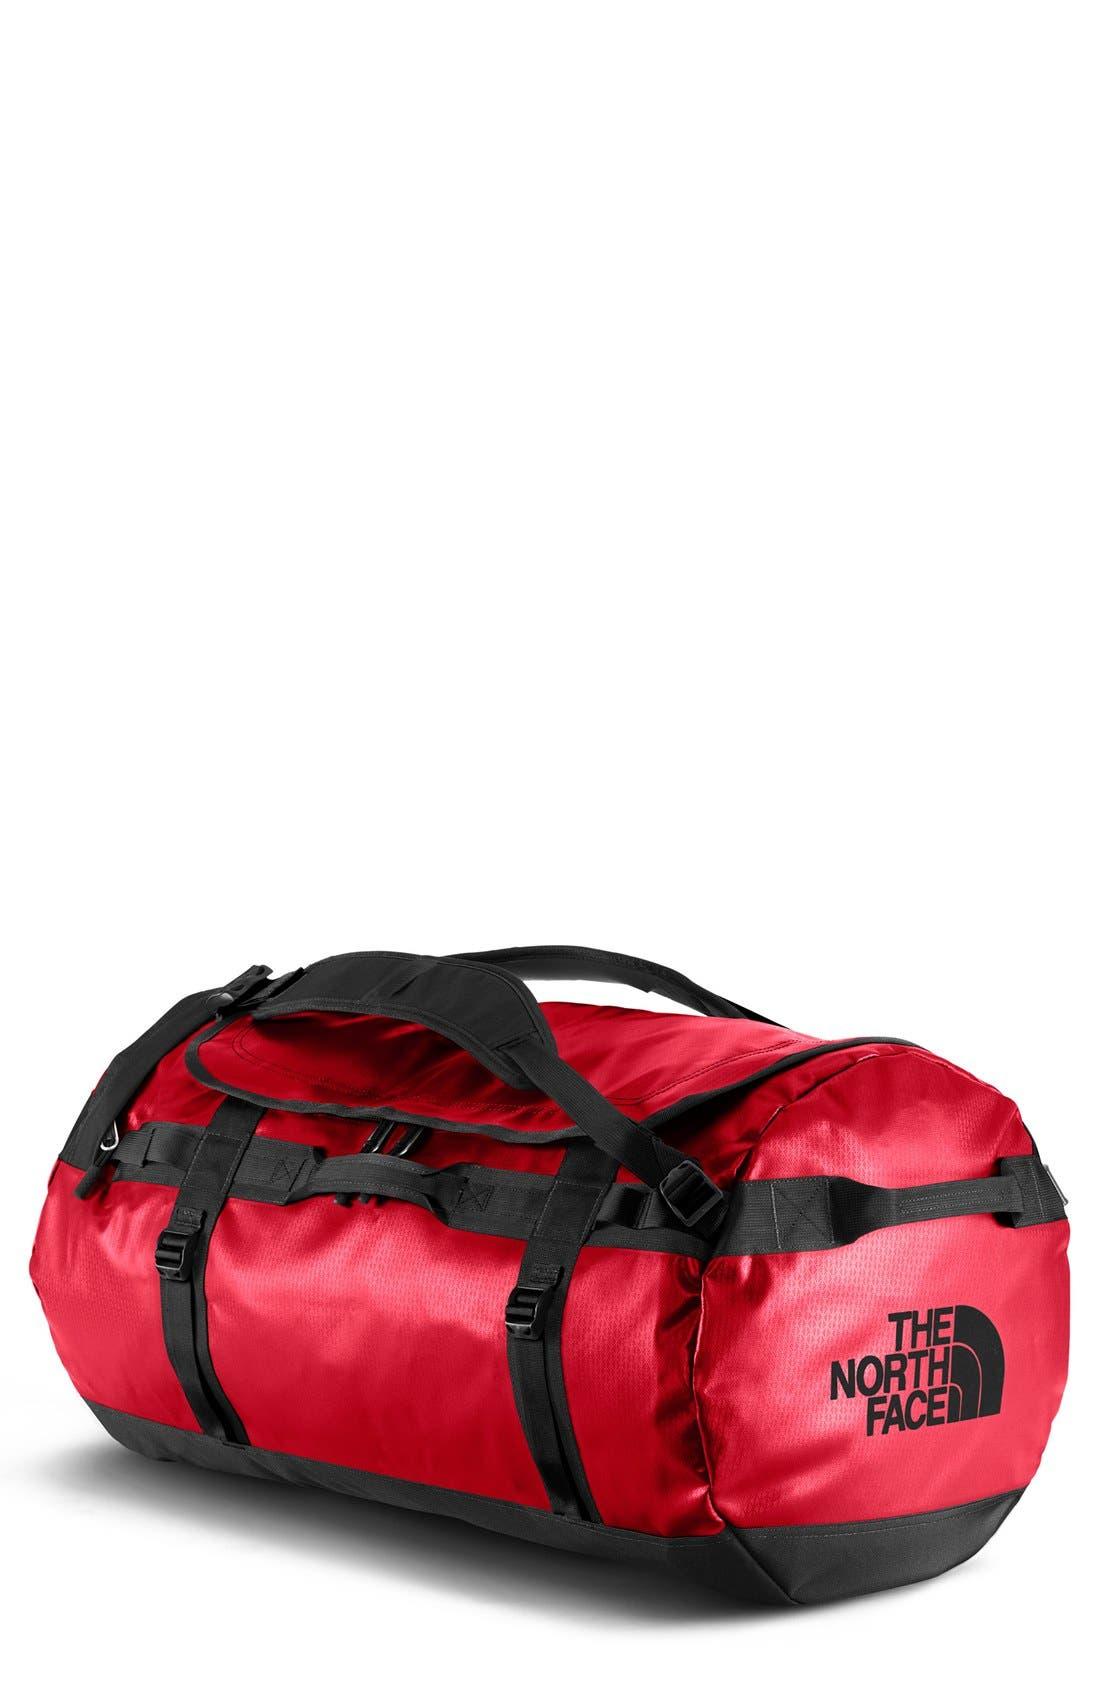 Main Image - The North Face 'Base Camp - Large' Duffel Bag